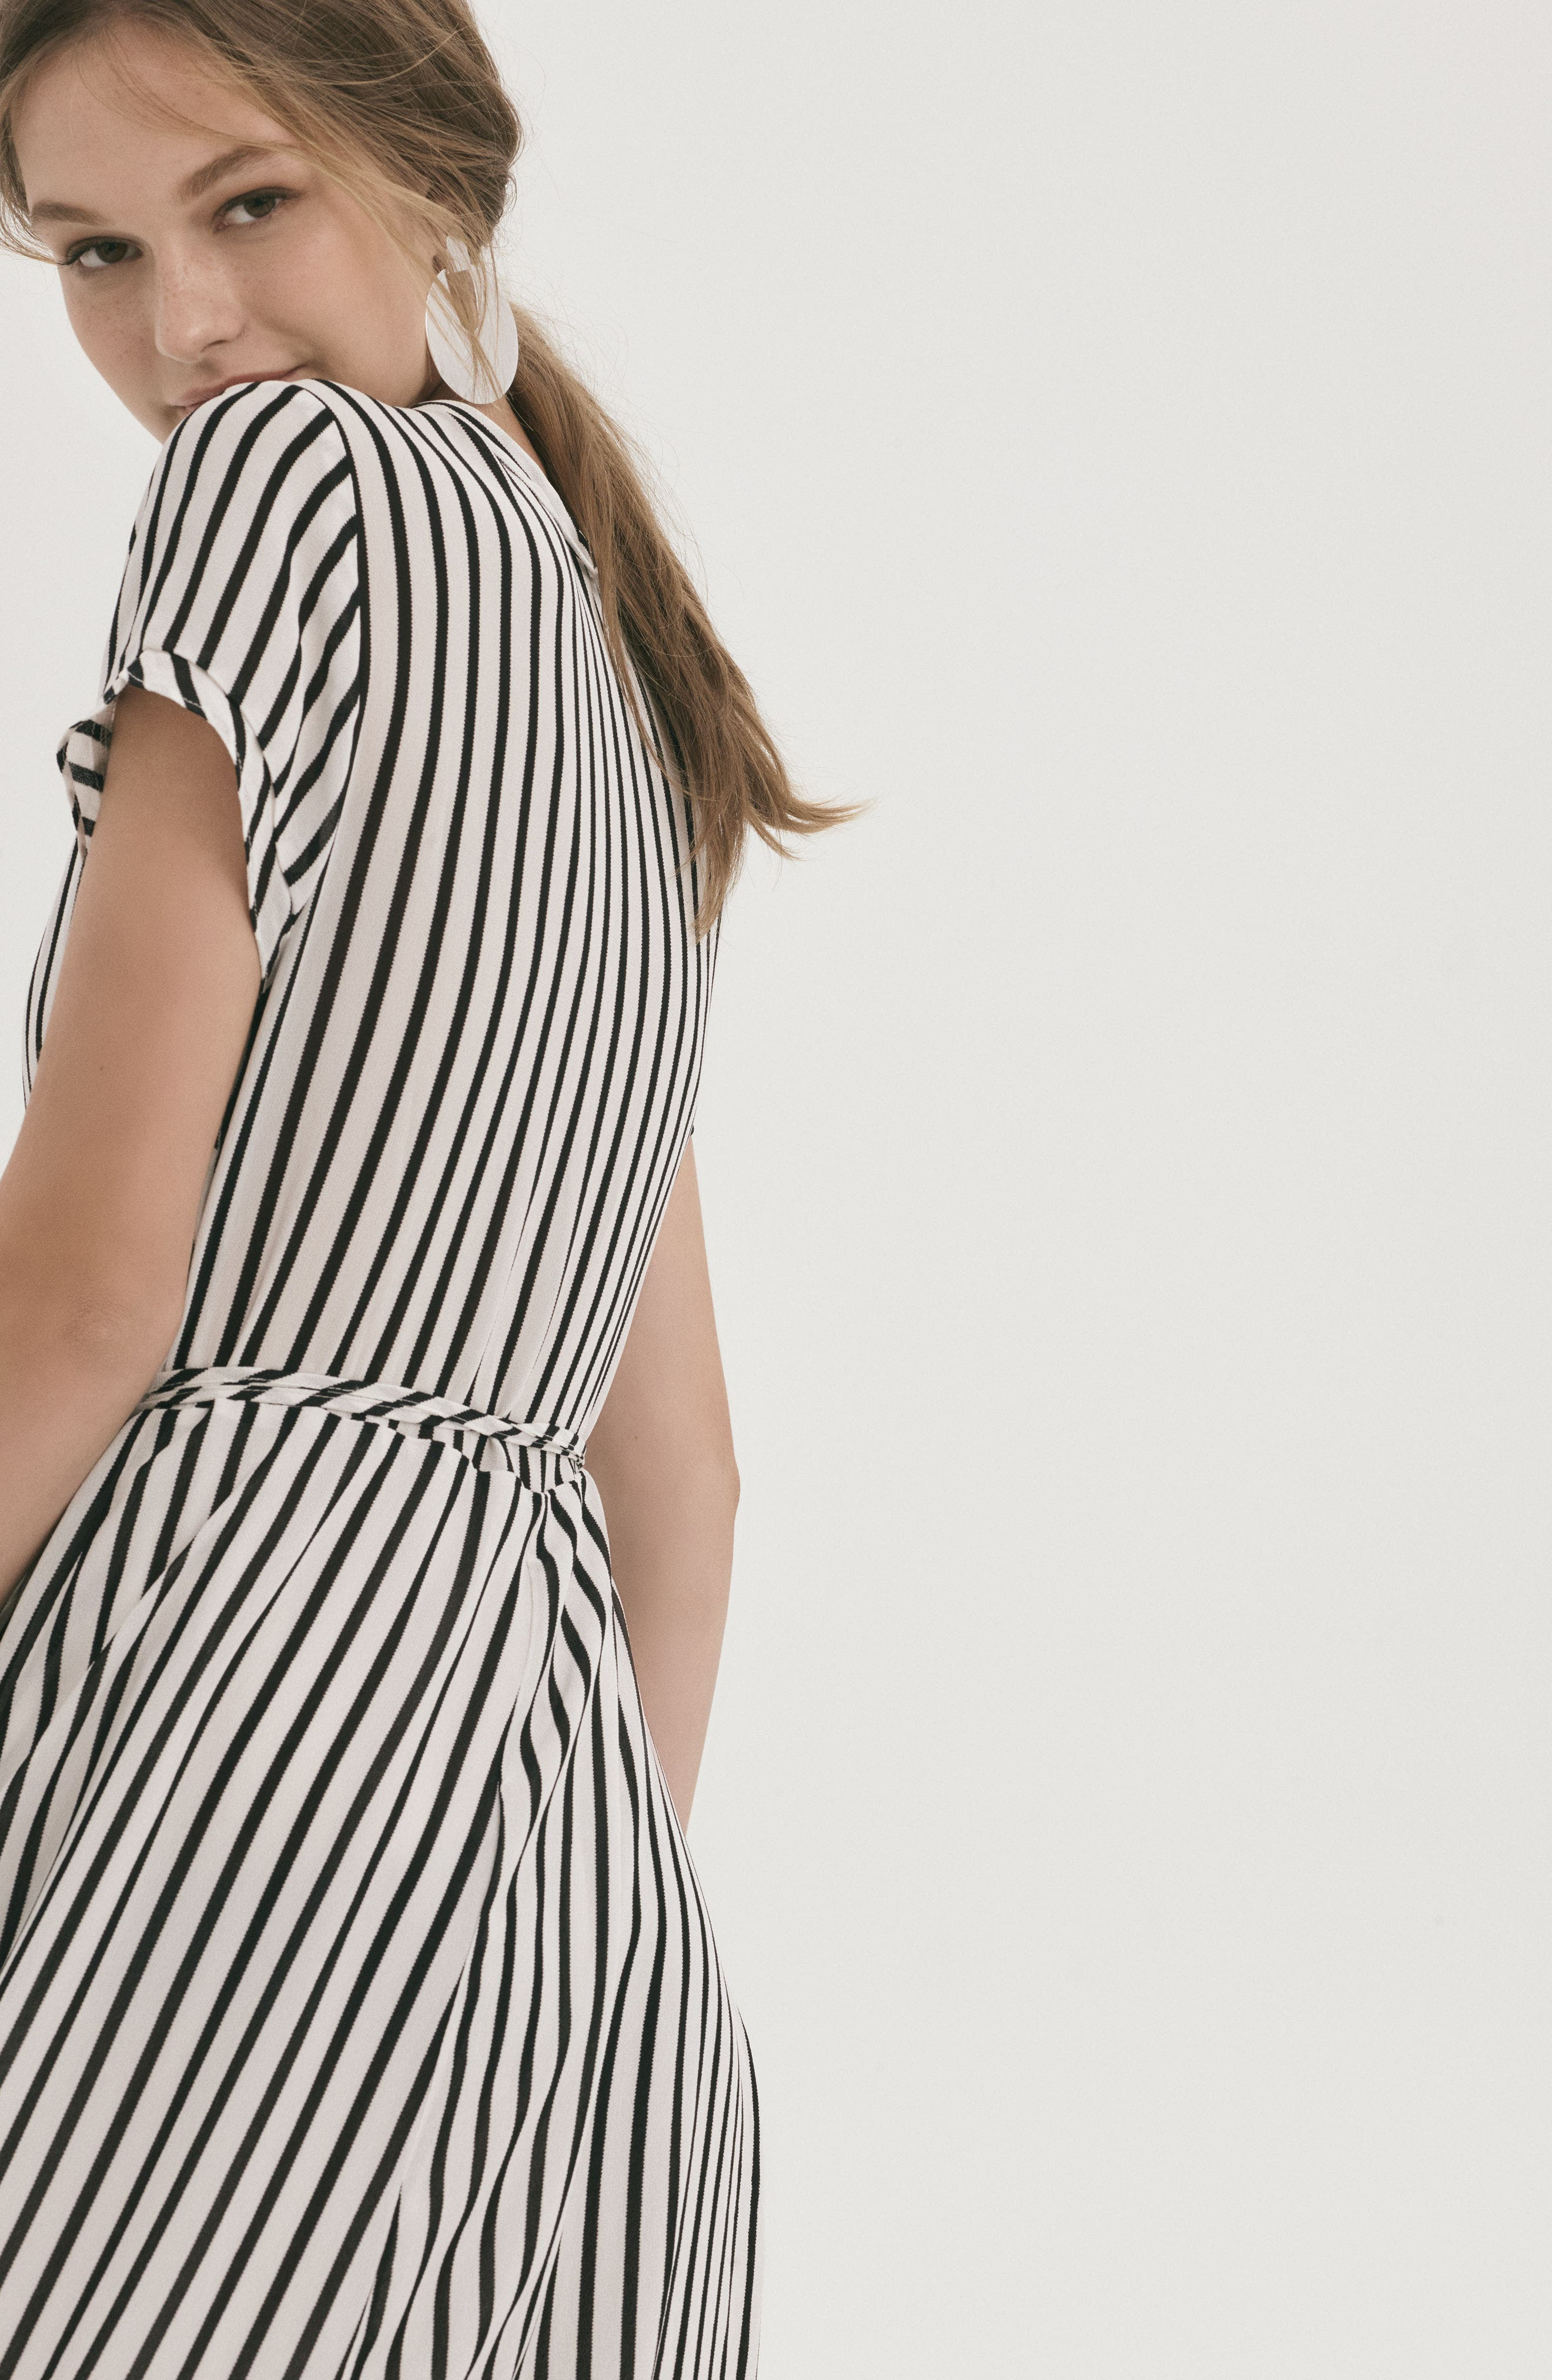 Adie Maxi Wrap Dress,                             Alternate thumbnail 11, color,                             013